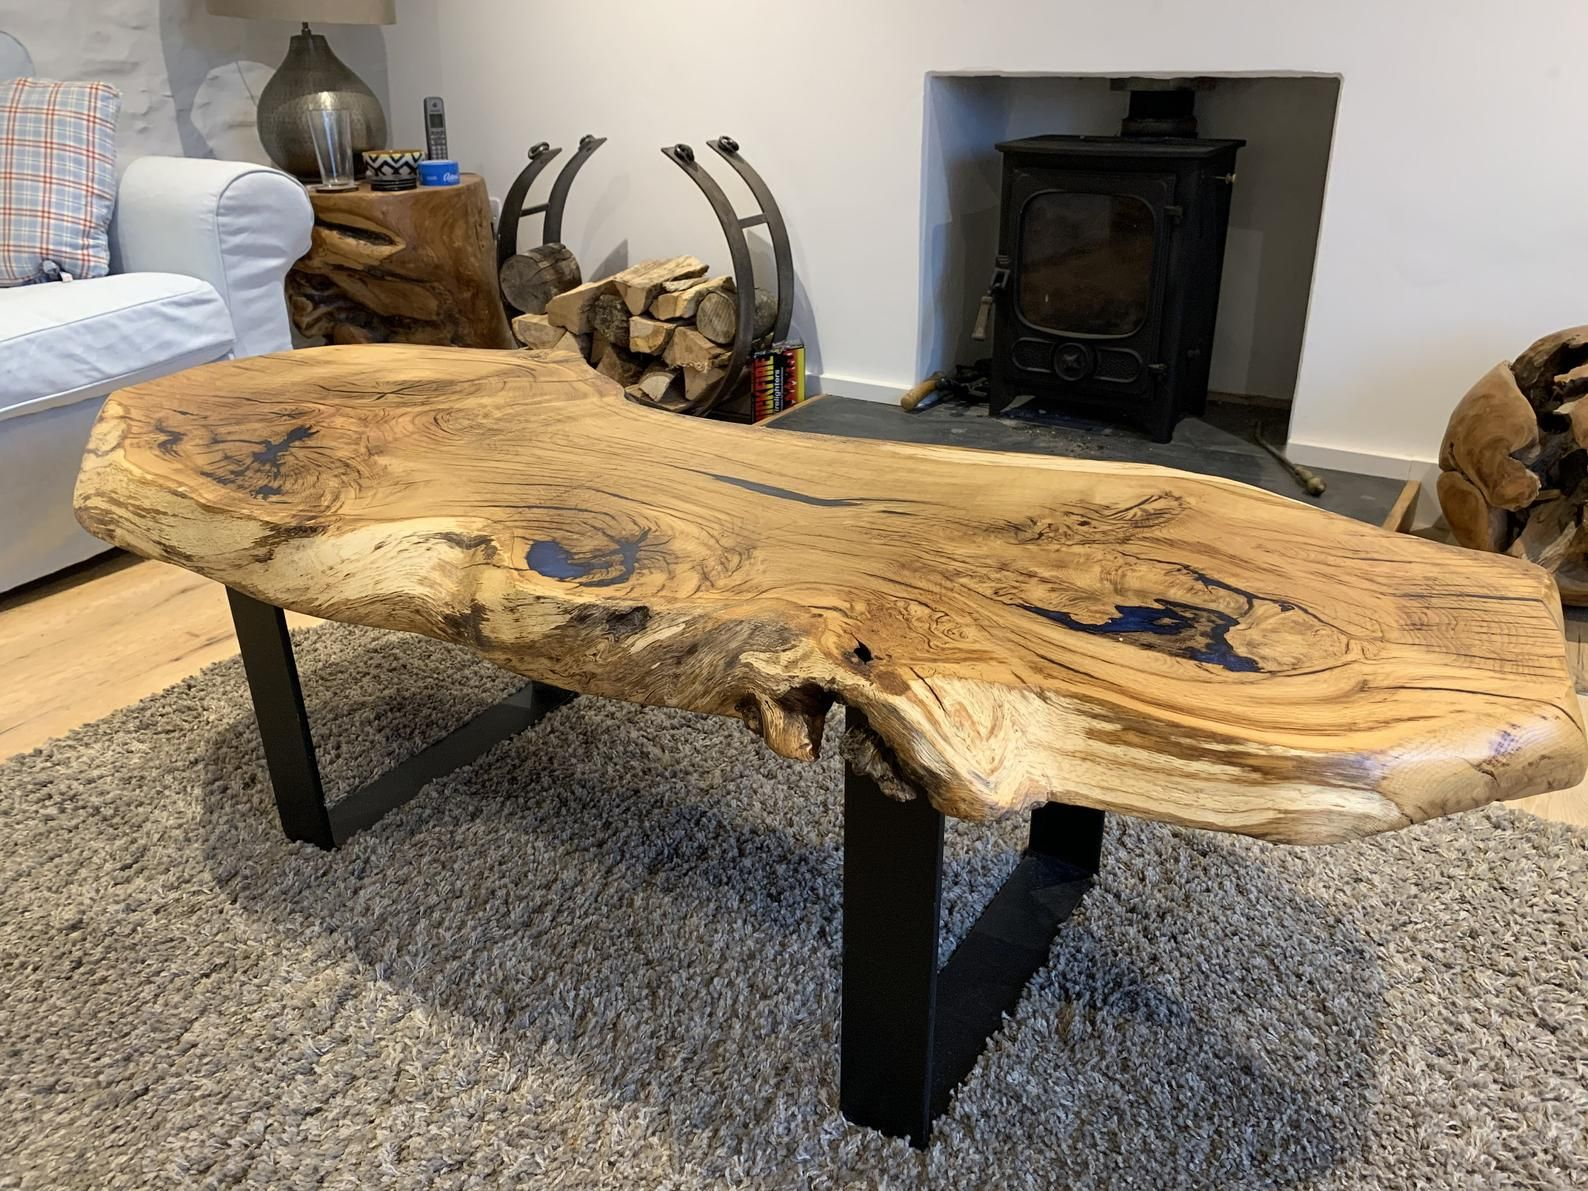 Sold Live Edge Oak Epoxy Resin Coffee Table Raw Wood Coffee Table Wood Coffee Table Living Room Wood Coffe Table [ 1191 x 1588 Pixel ]